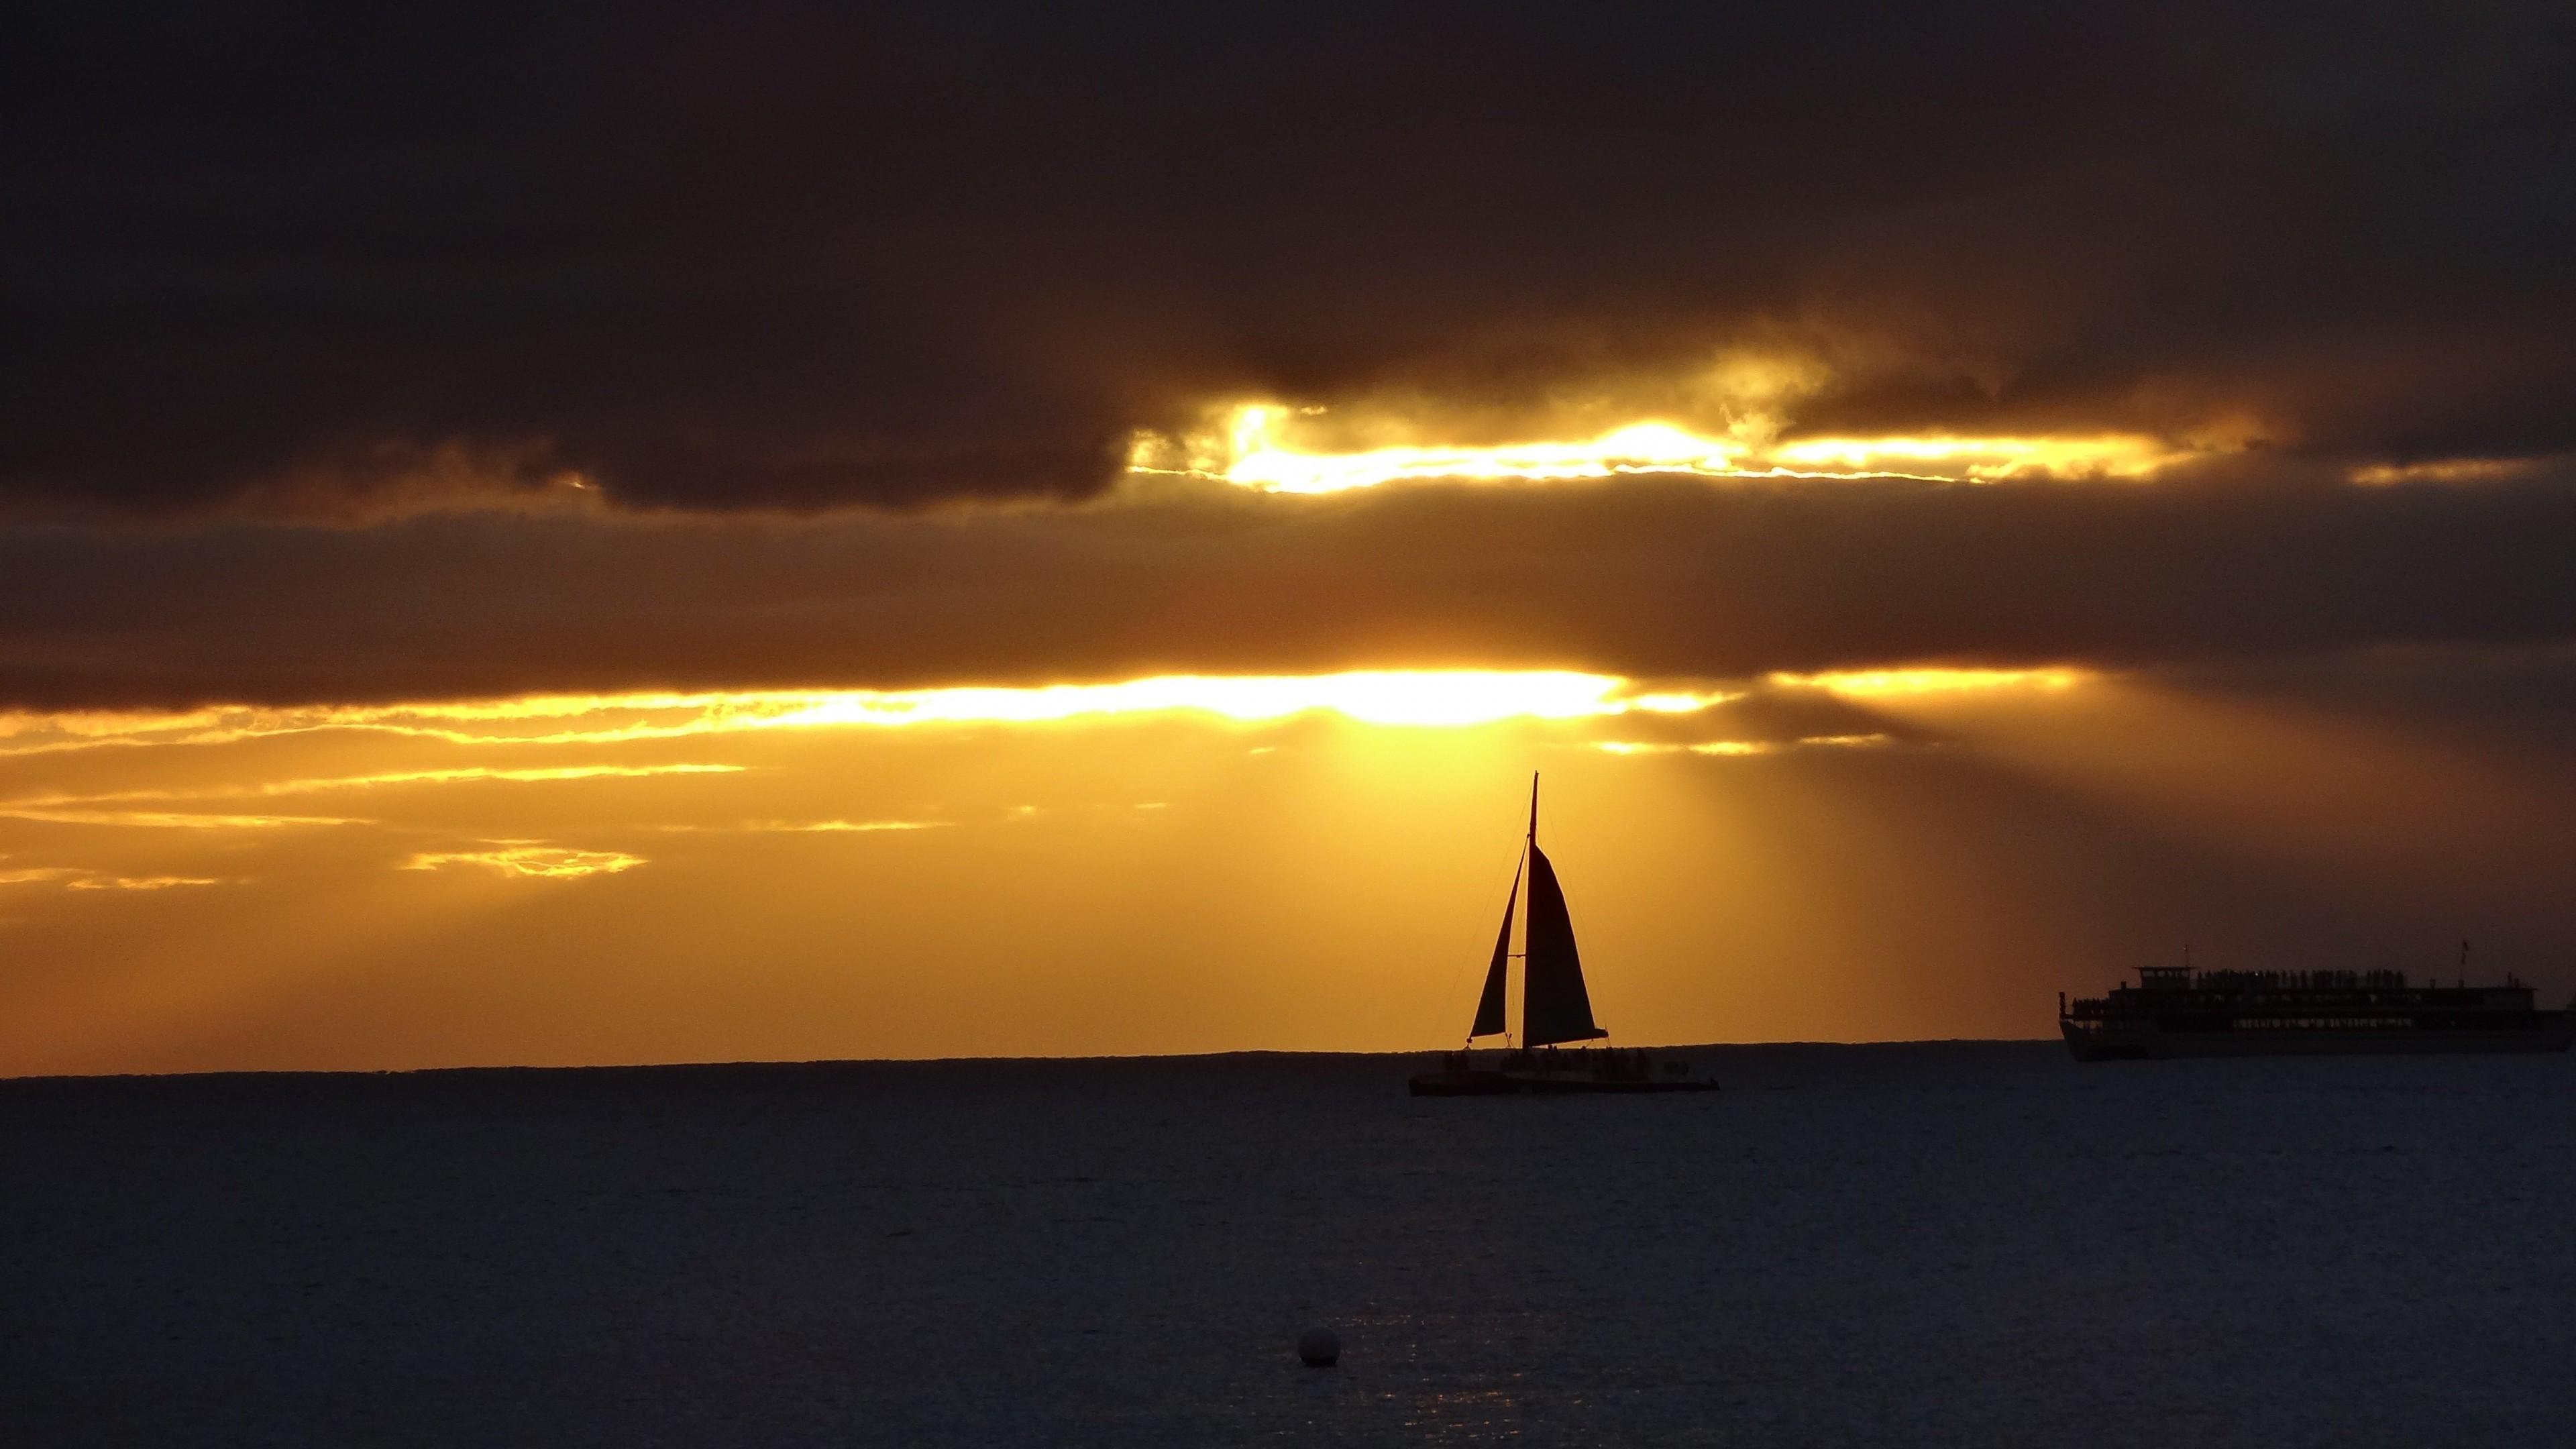 Res: 3840x2160, Sailboat sea sunset lights dark ultra hd wallpapers 4k